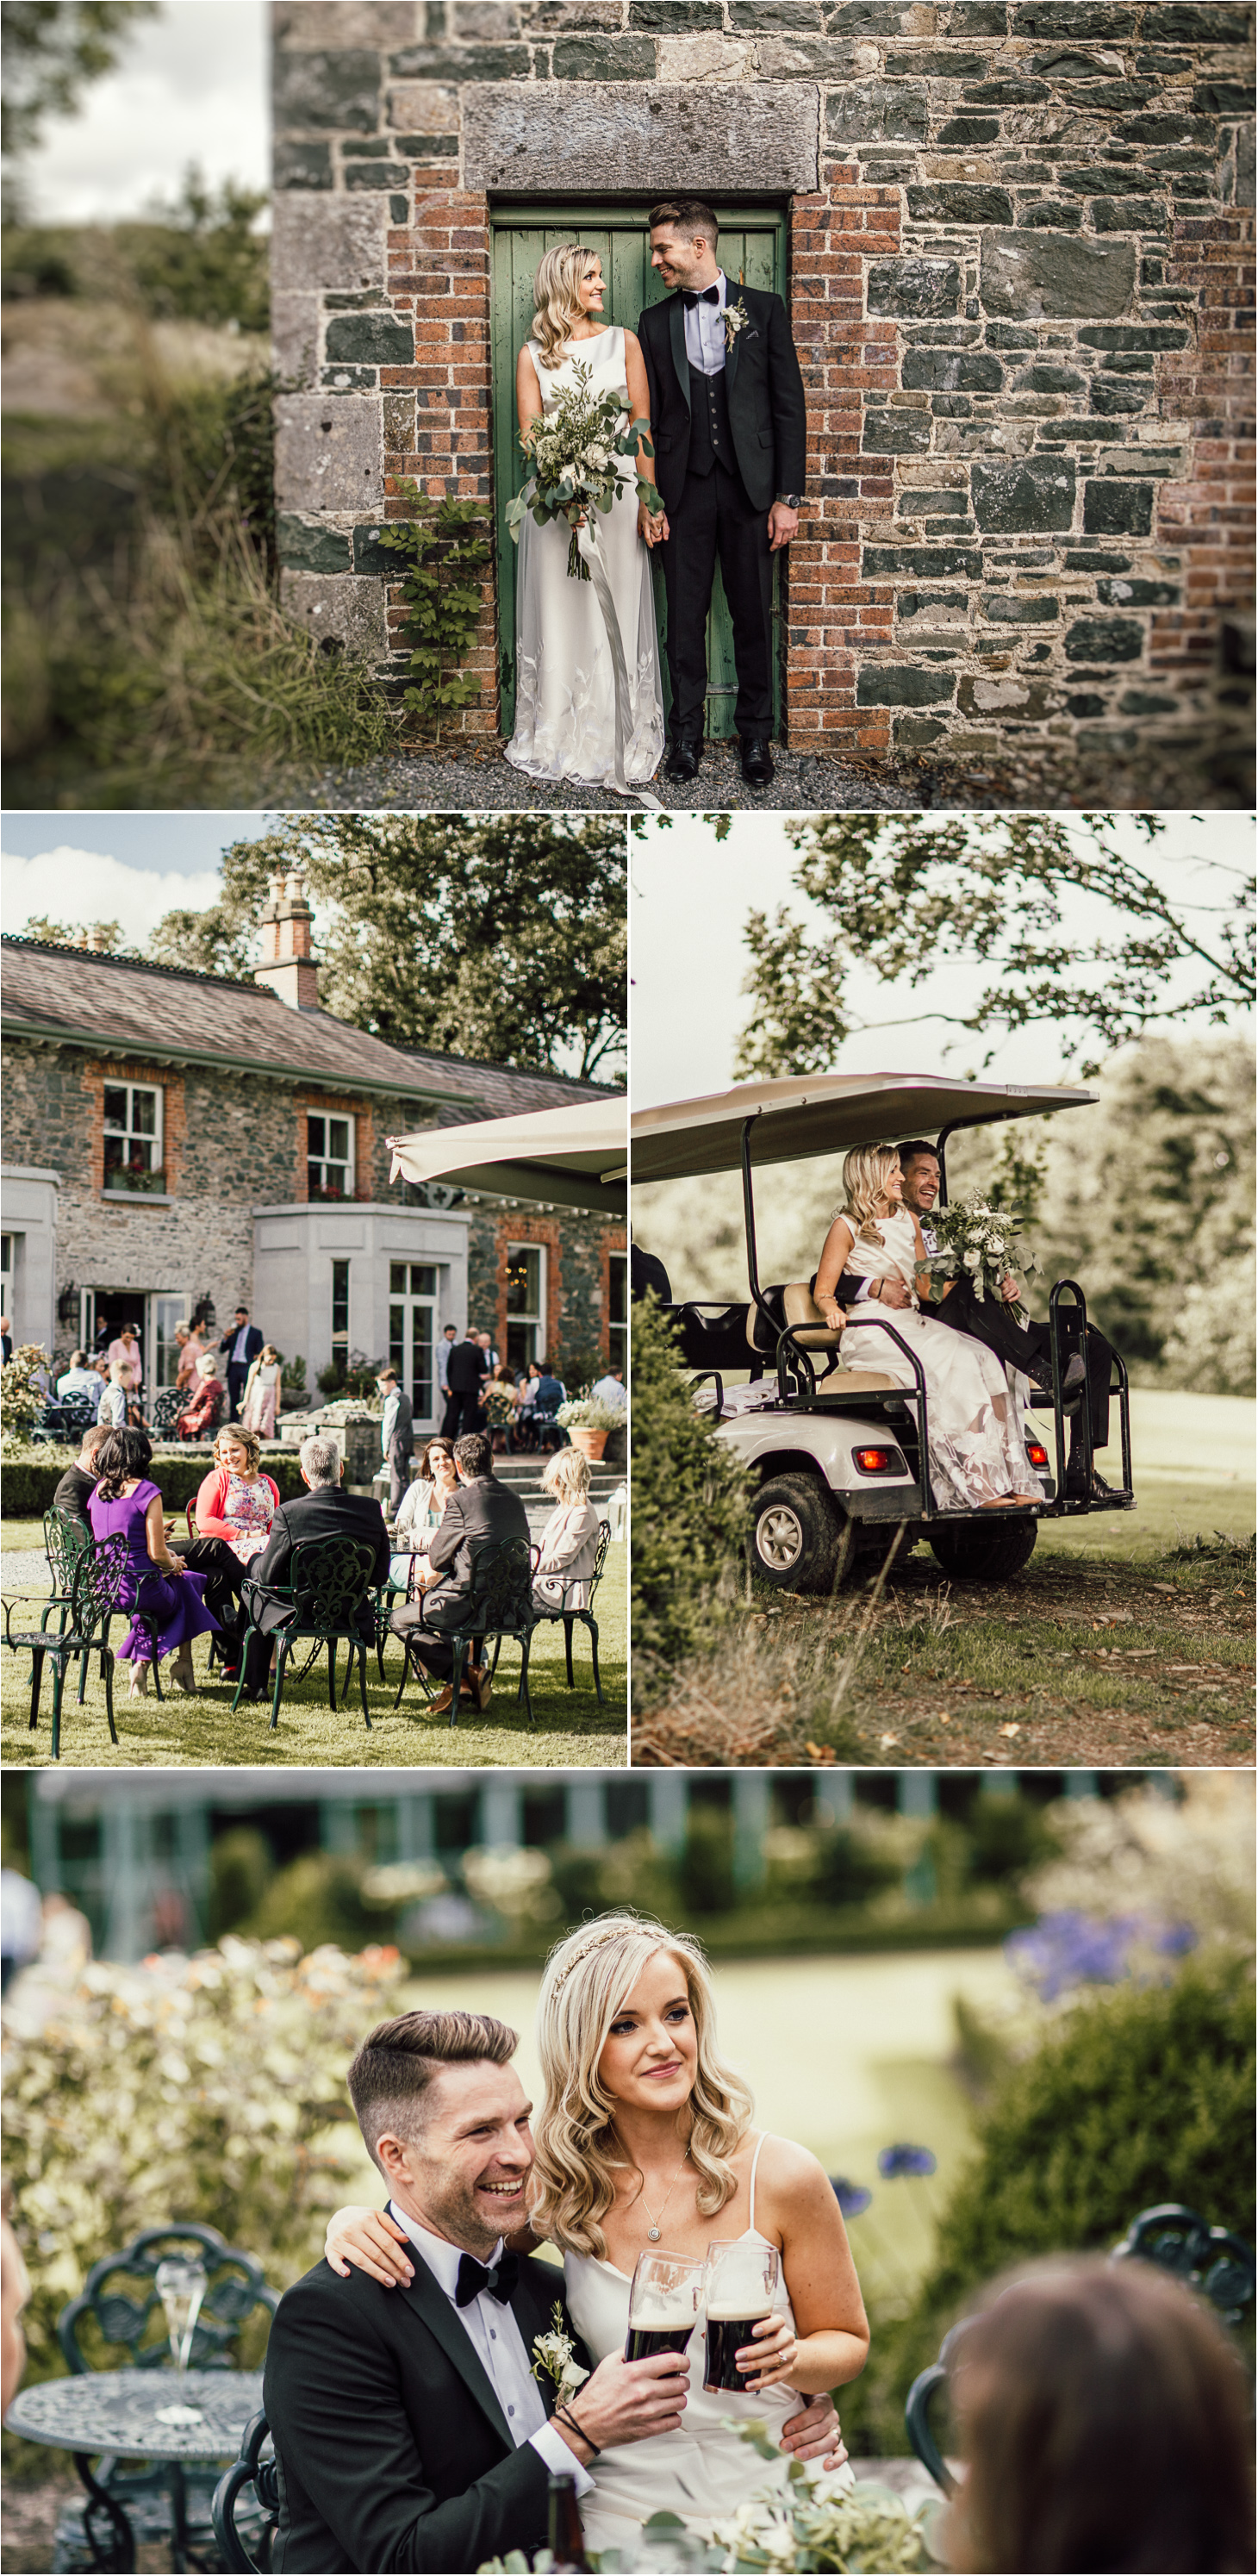 Virgina Lodge Photography. darren fitzpatrick. Wedding.21